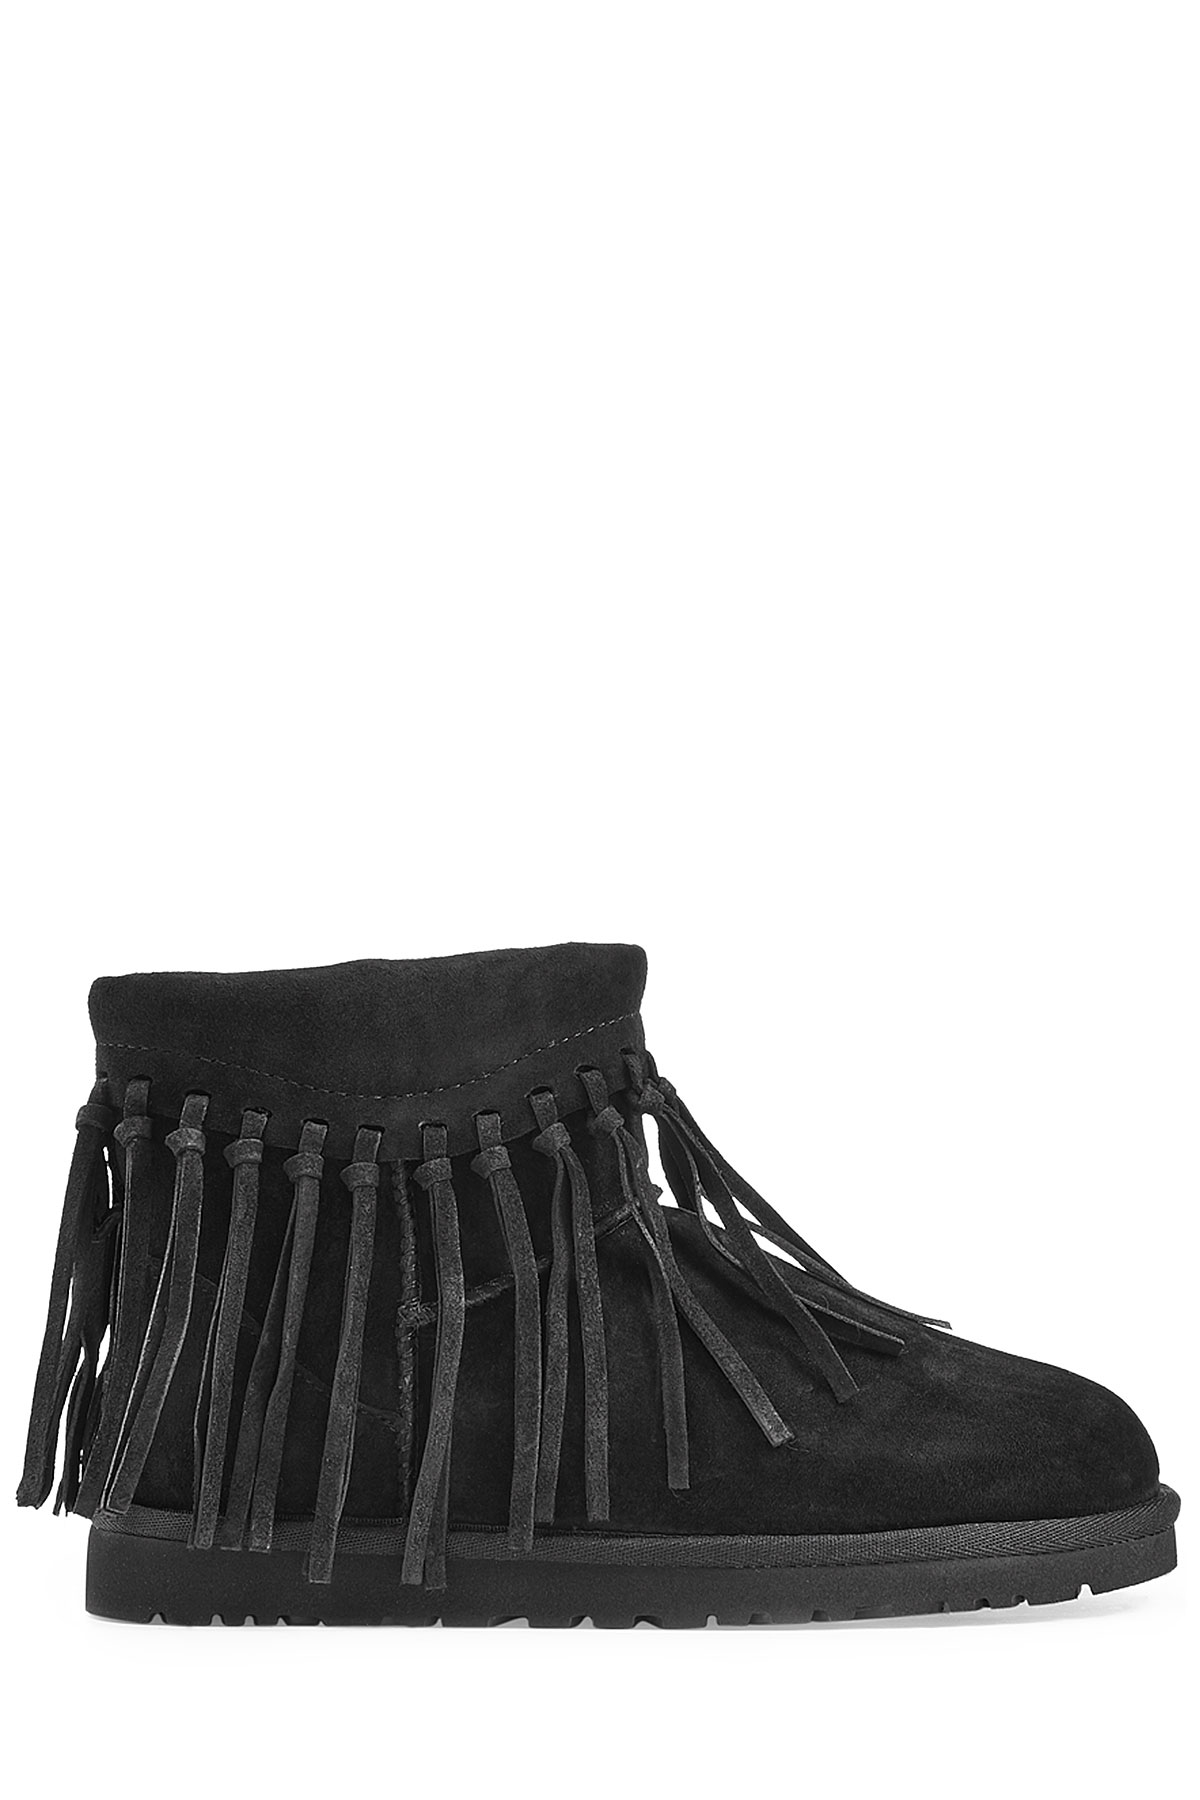 d5e6a7533f6 UGG Wynona Fringe Sheepskin Boots - Black